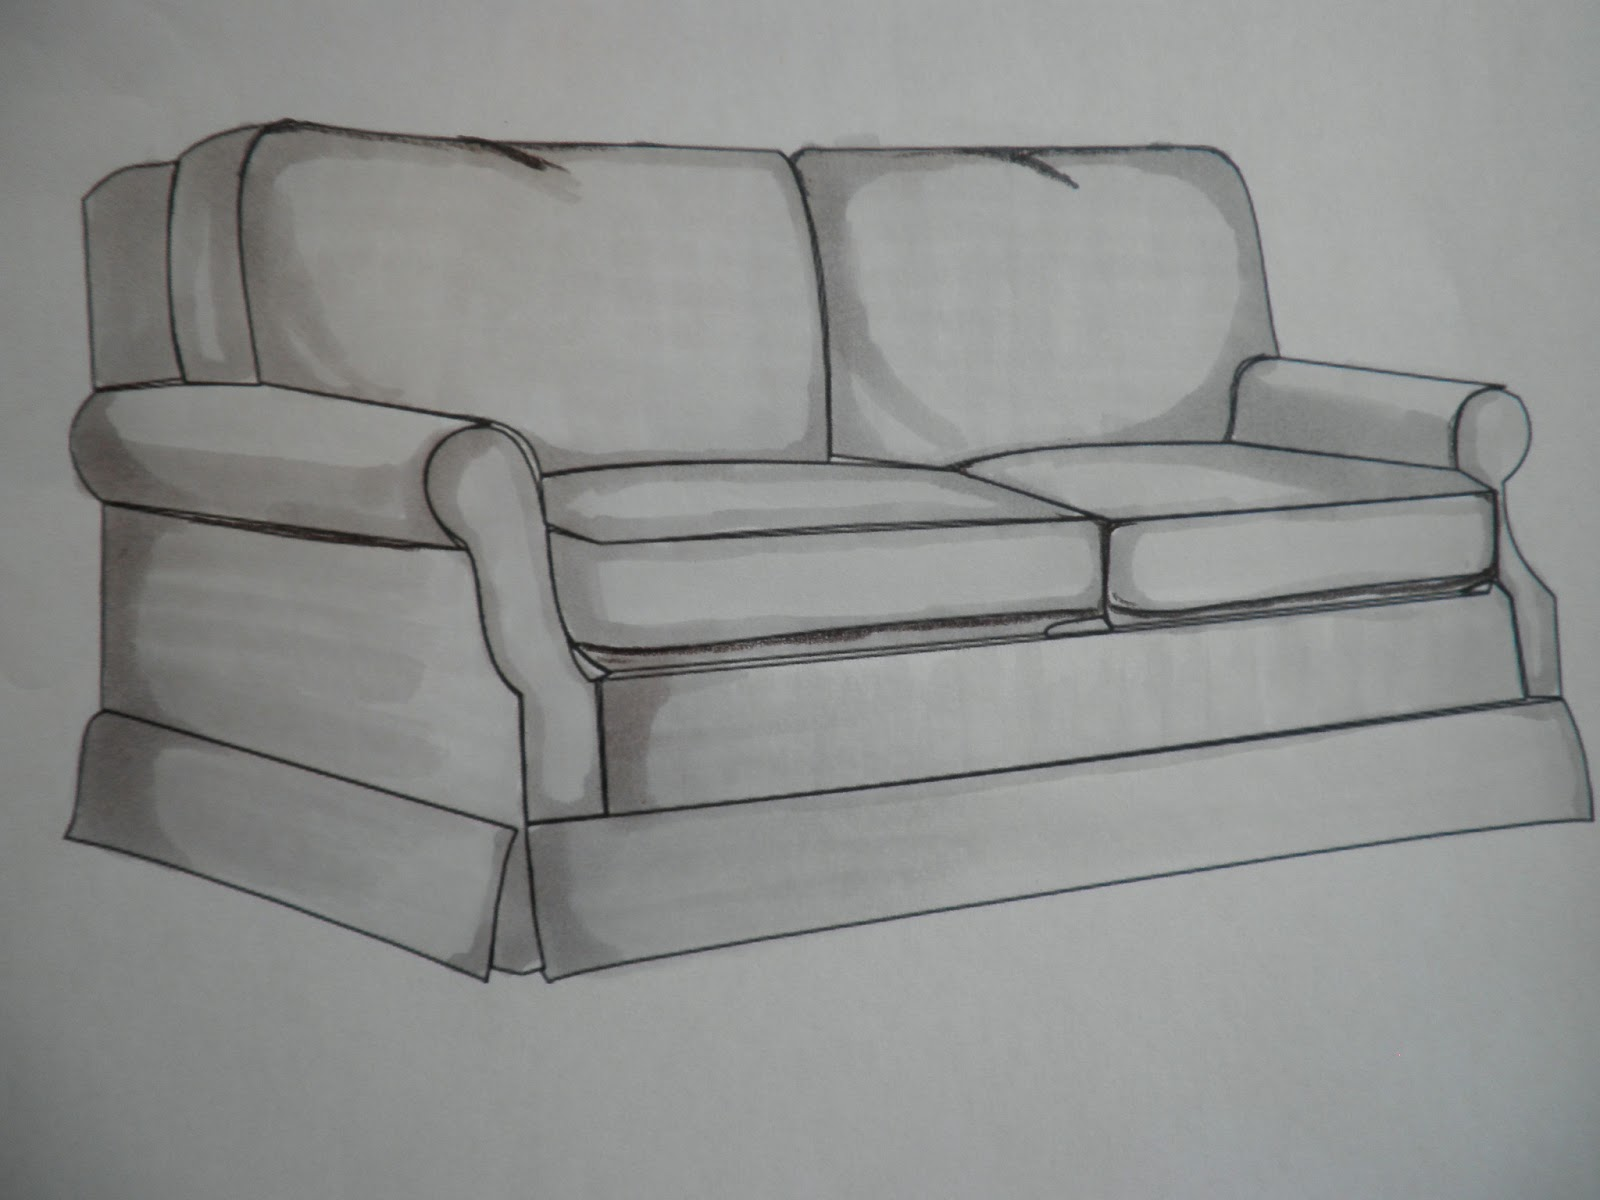 Tiffany Leigh Interior Design: Wednesday's Sketchbook: How ...